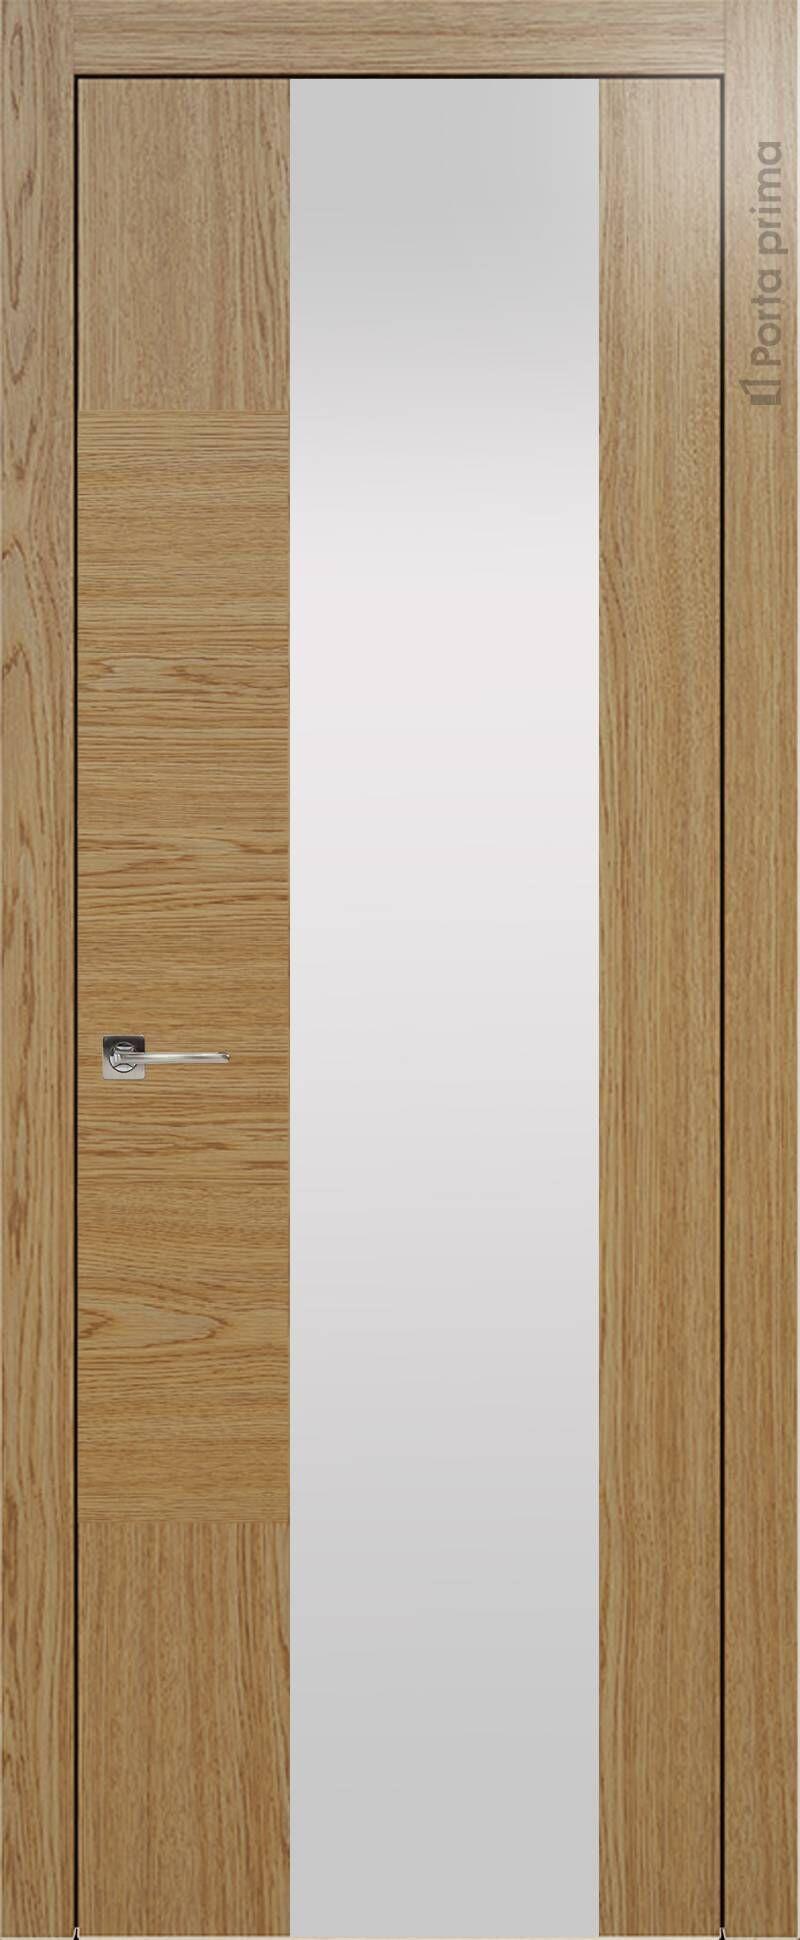 Tivoli Е-1 цвет - Дуб карамель Со стеклом (ДО)